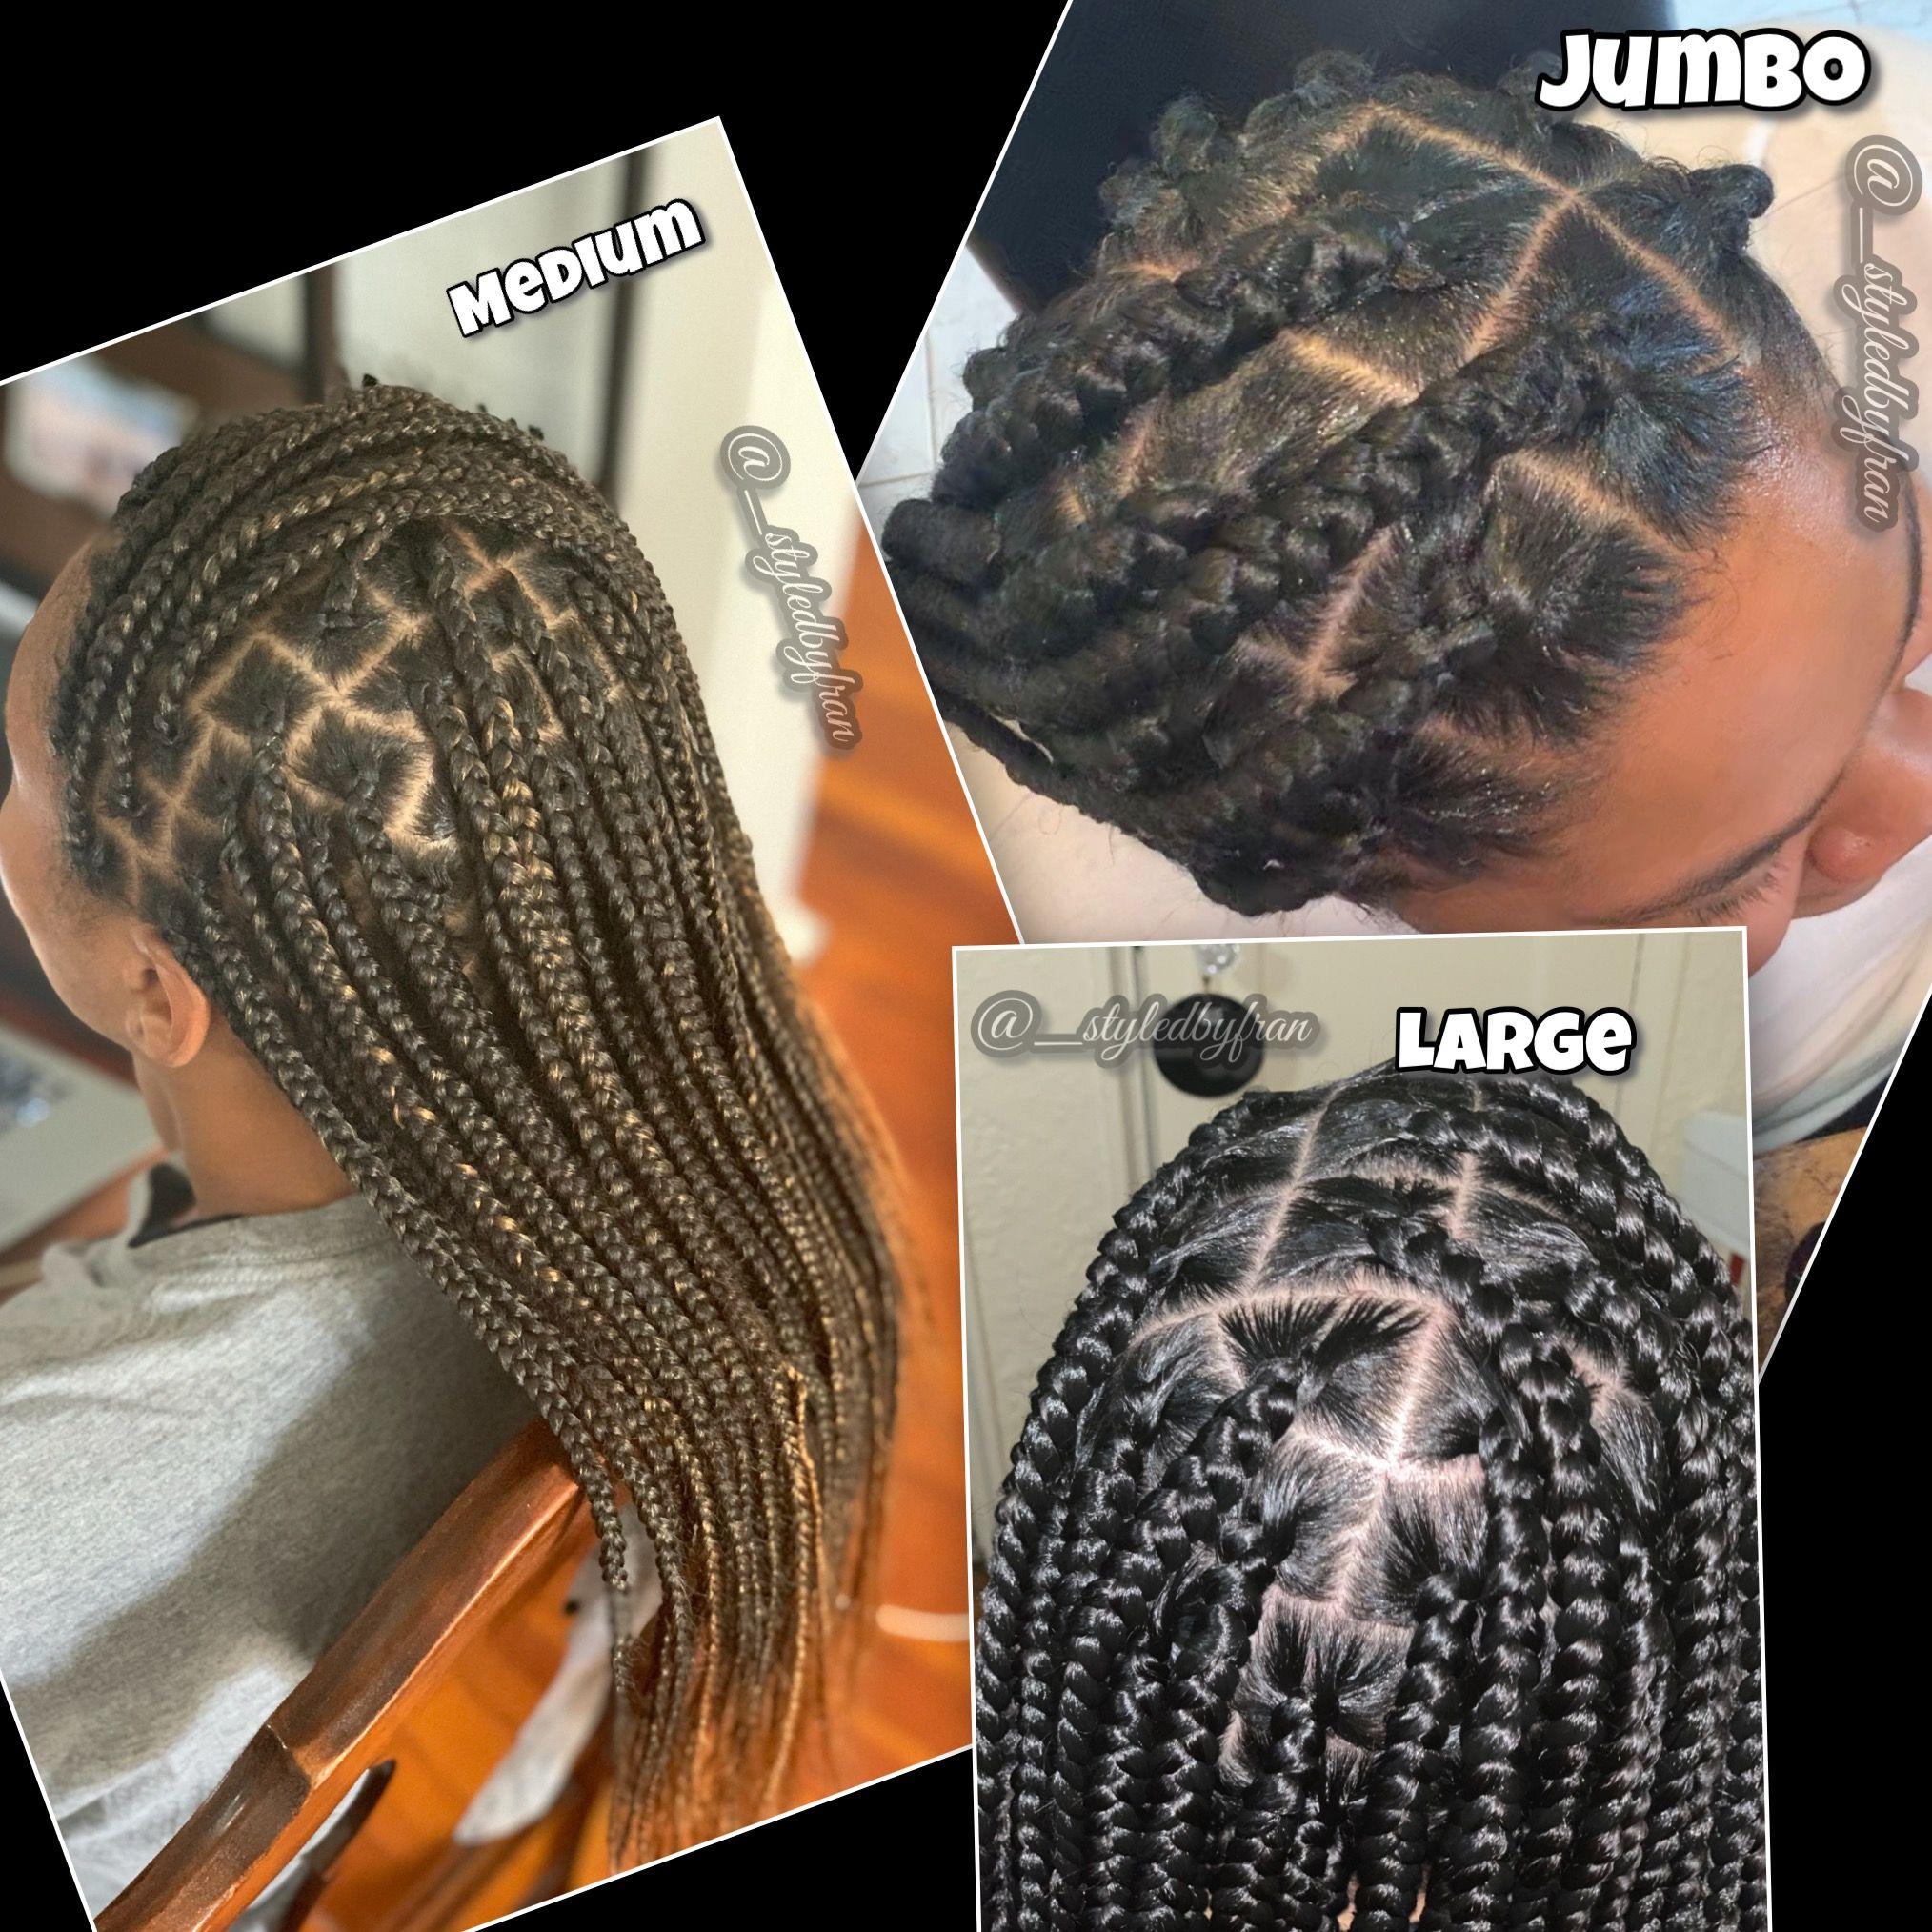 Knotless Box Braid Sizes Knotlessbraids Boxbraids Sizechart Knotless Braids Westchester And B Box Braids Sizes Girls Hairstyles Braids Natural Hair Styles